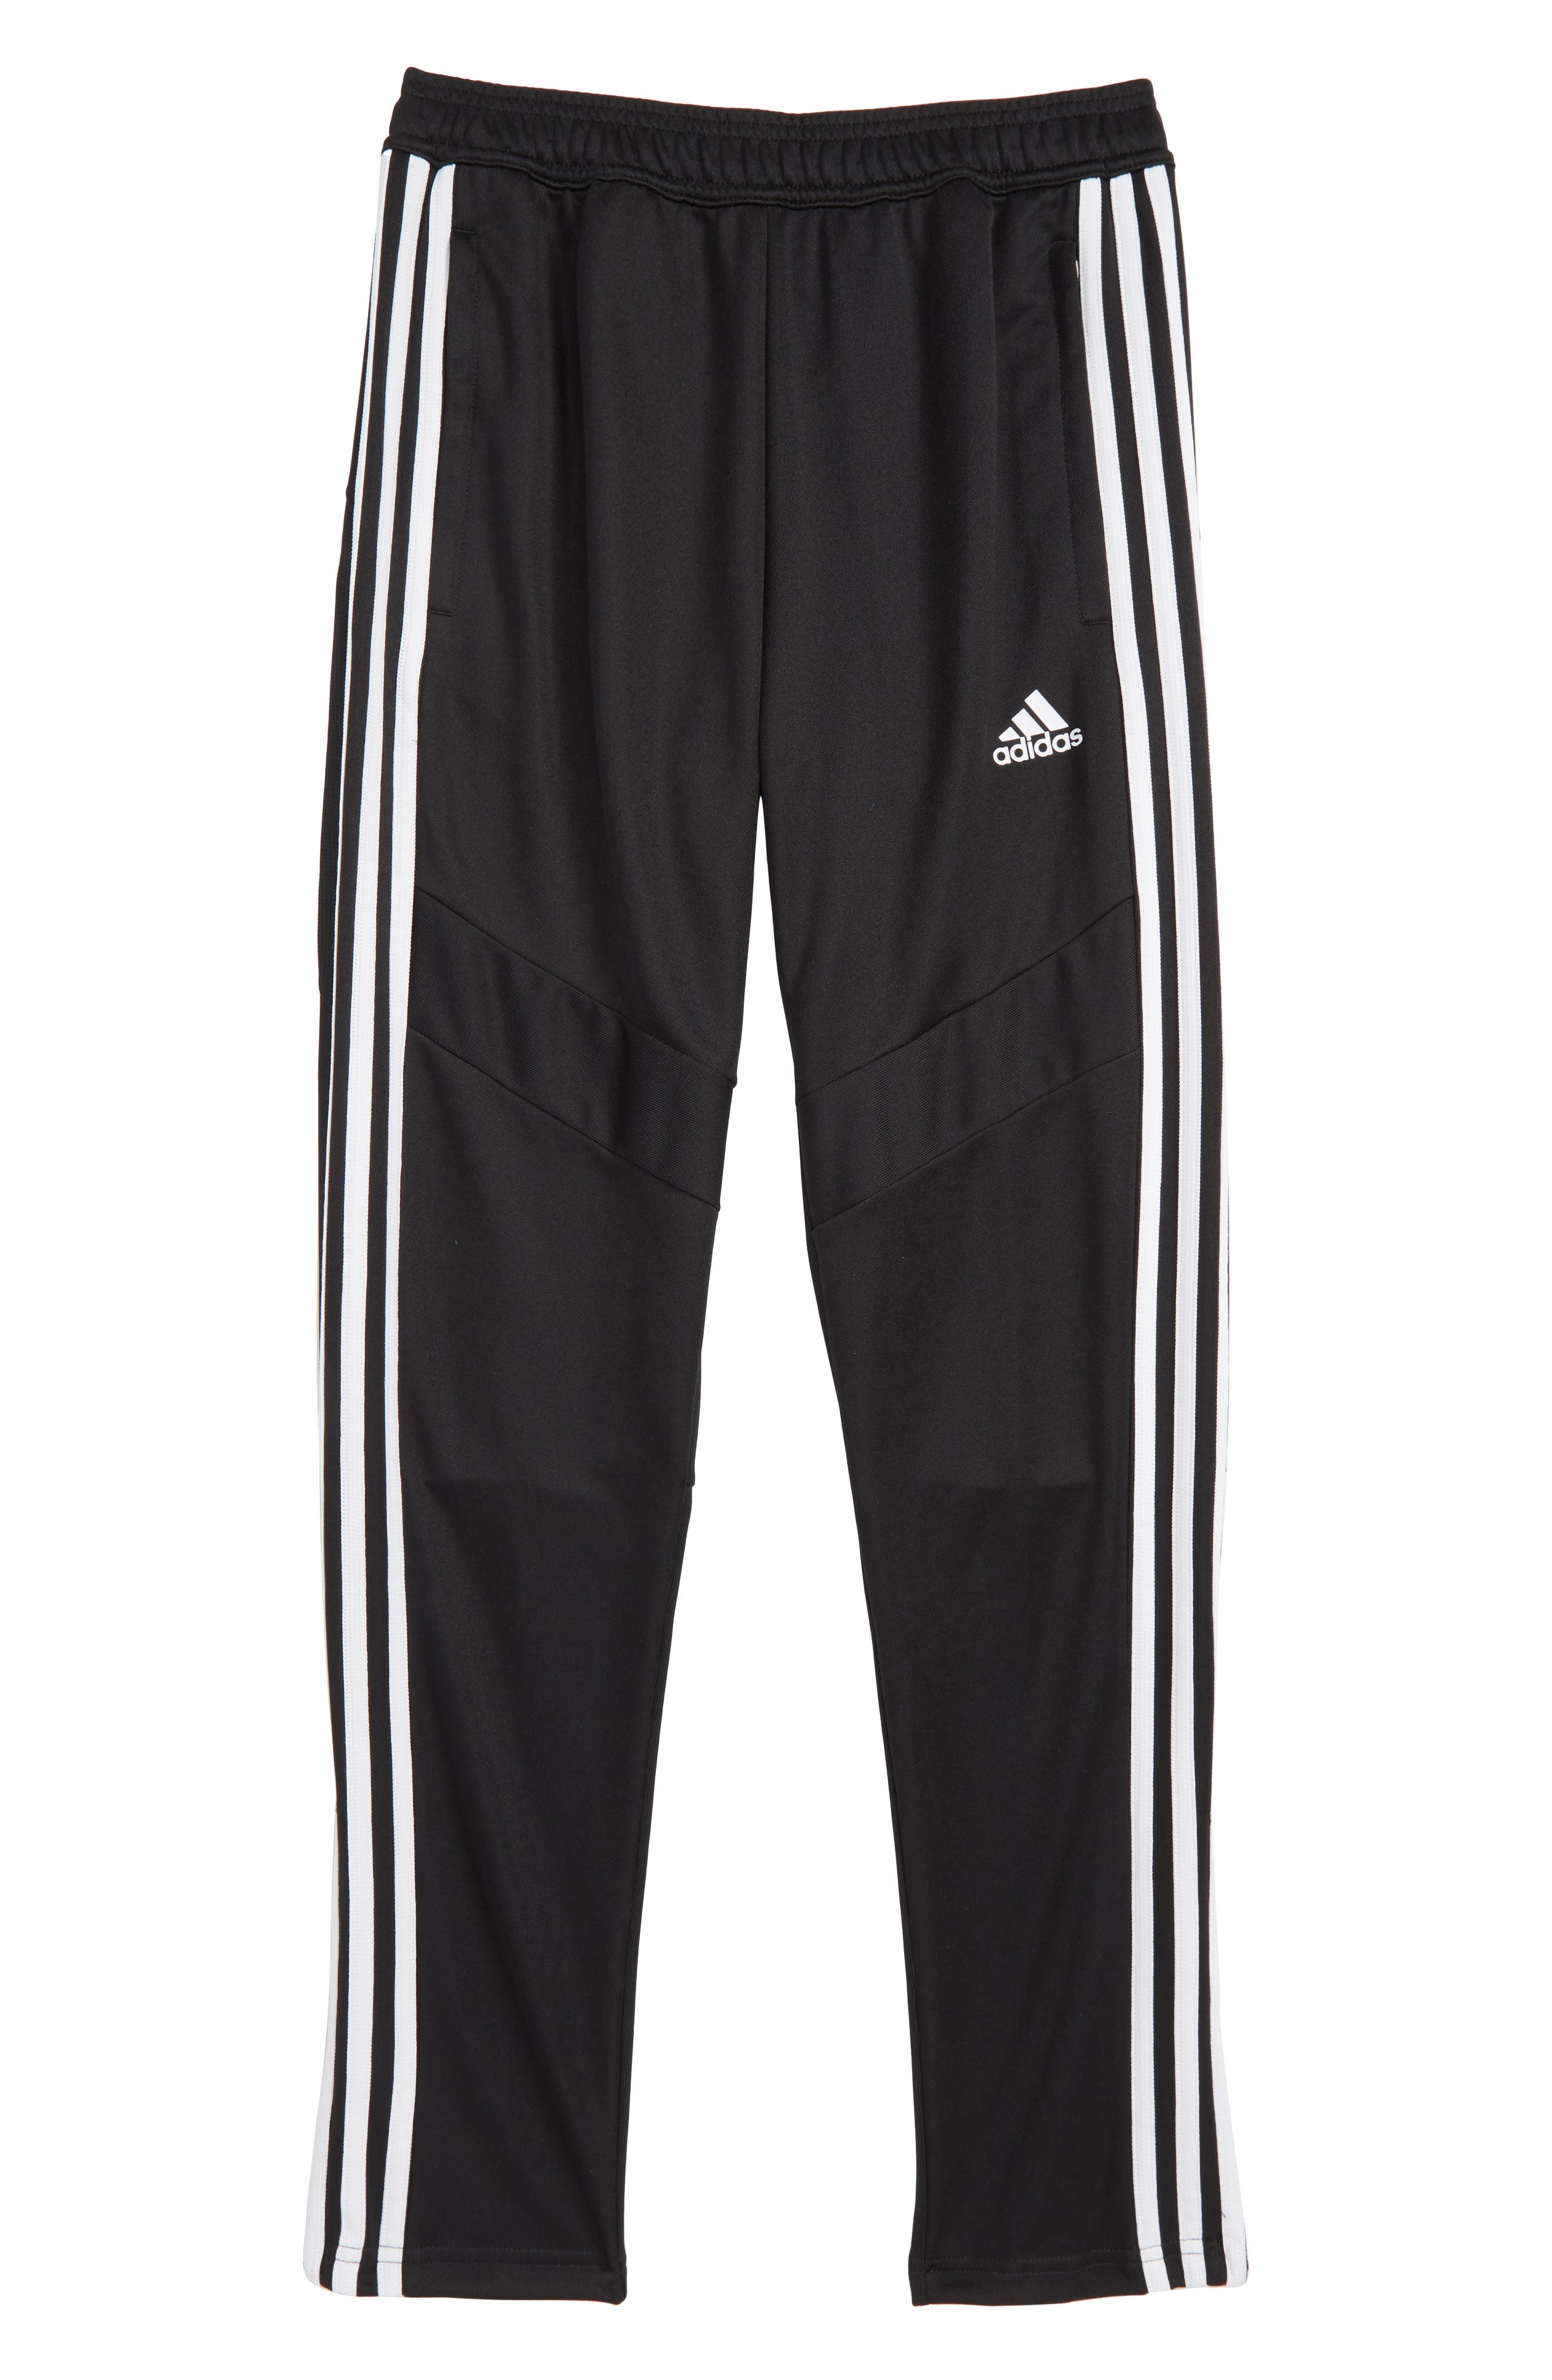 Tiro19 Sweatpants,                         Main,                         color, BLACK / WHITE